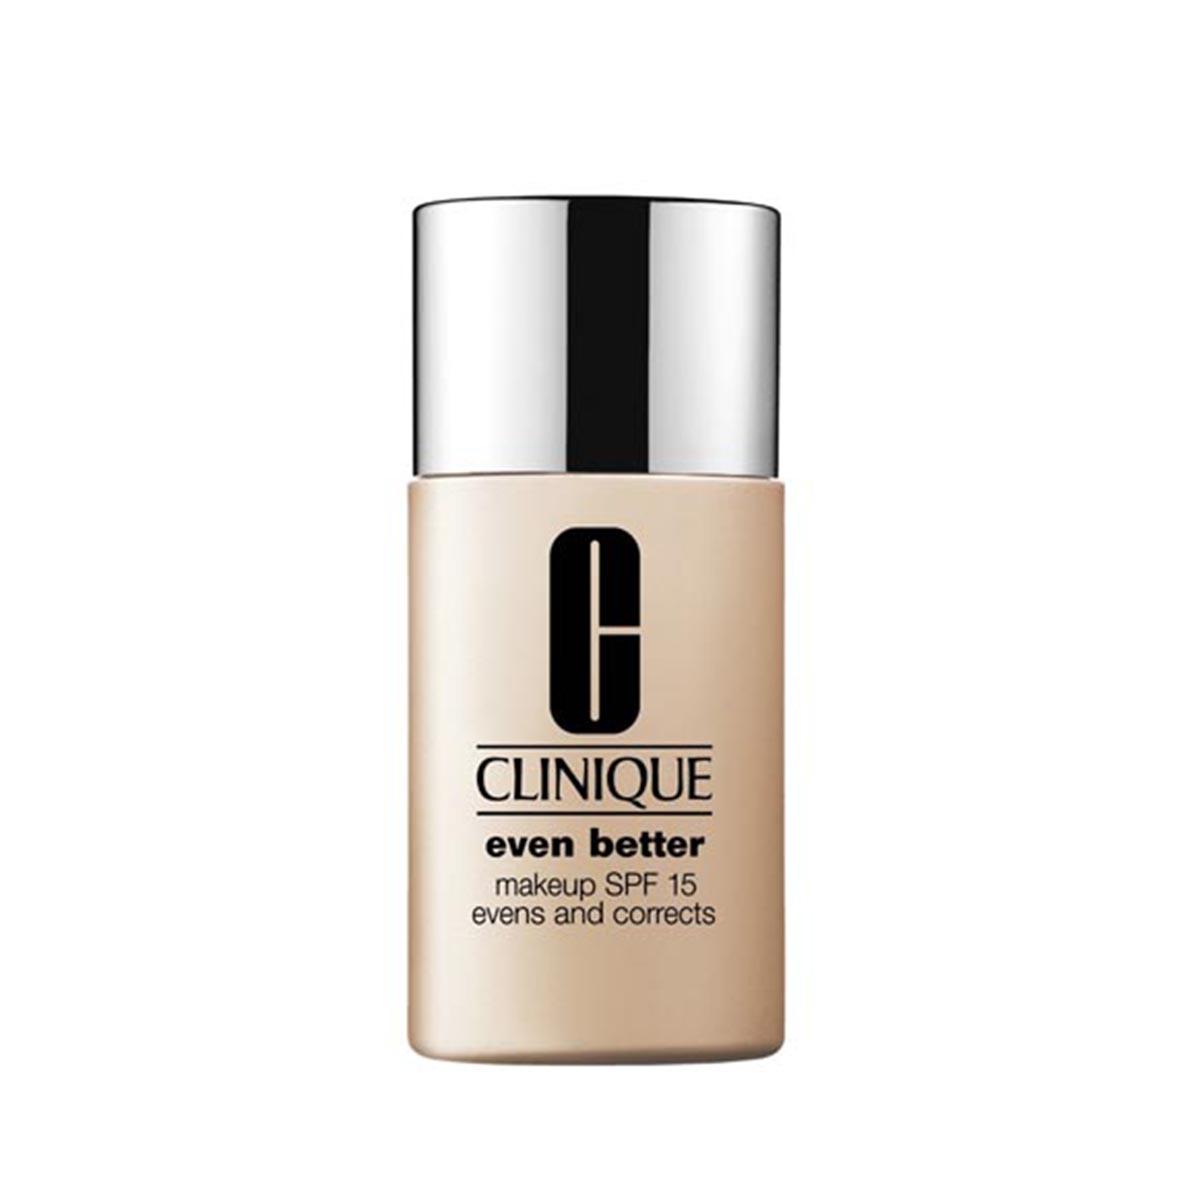 Clinique even better spf15 makeup cn74